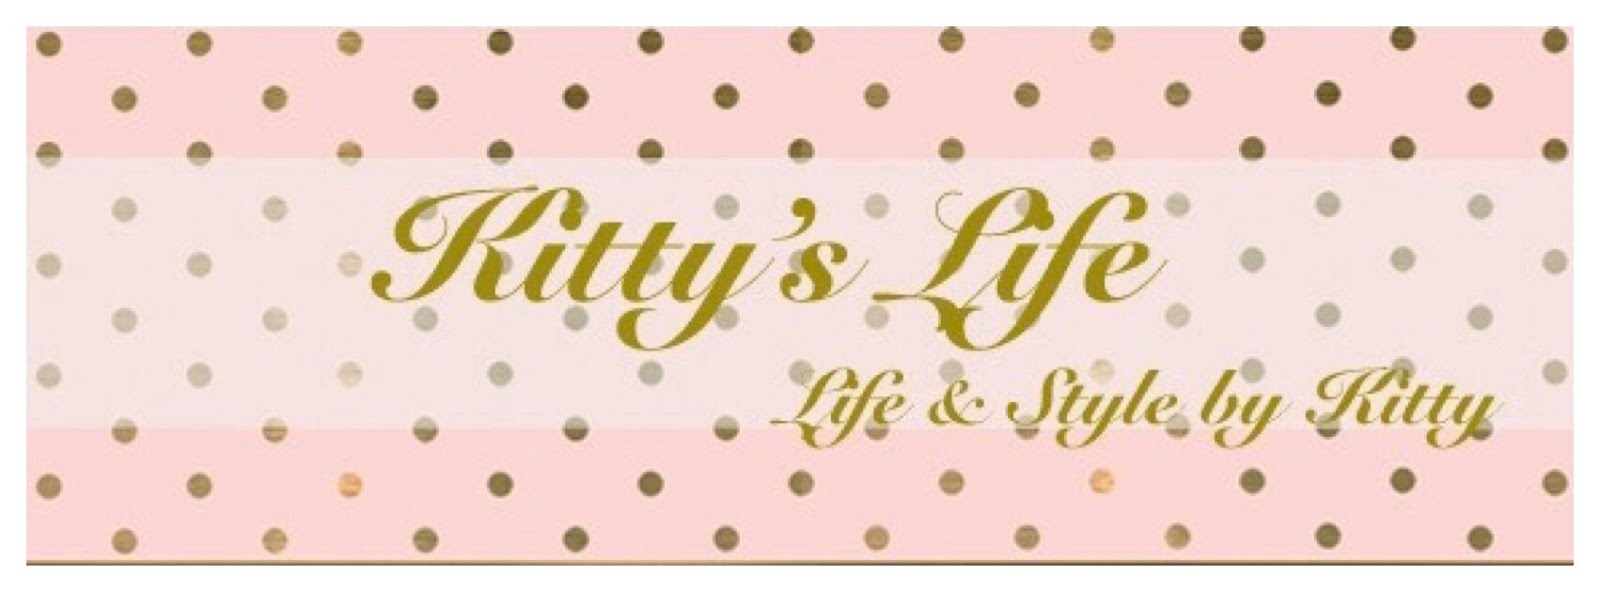 Kitty's Life